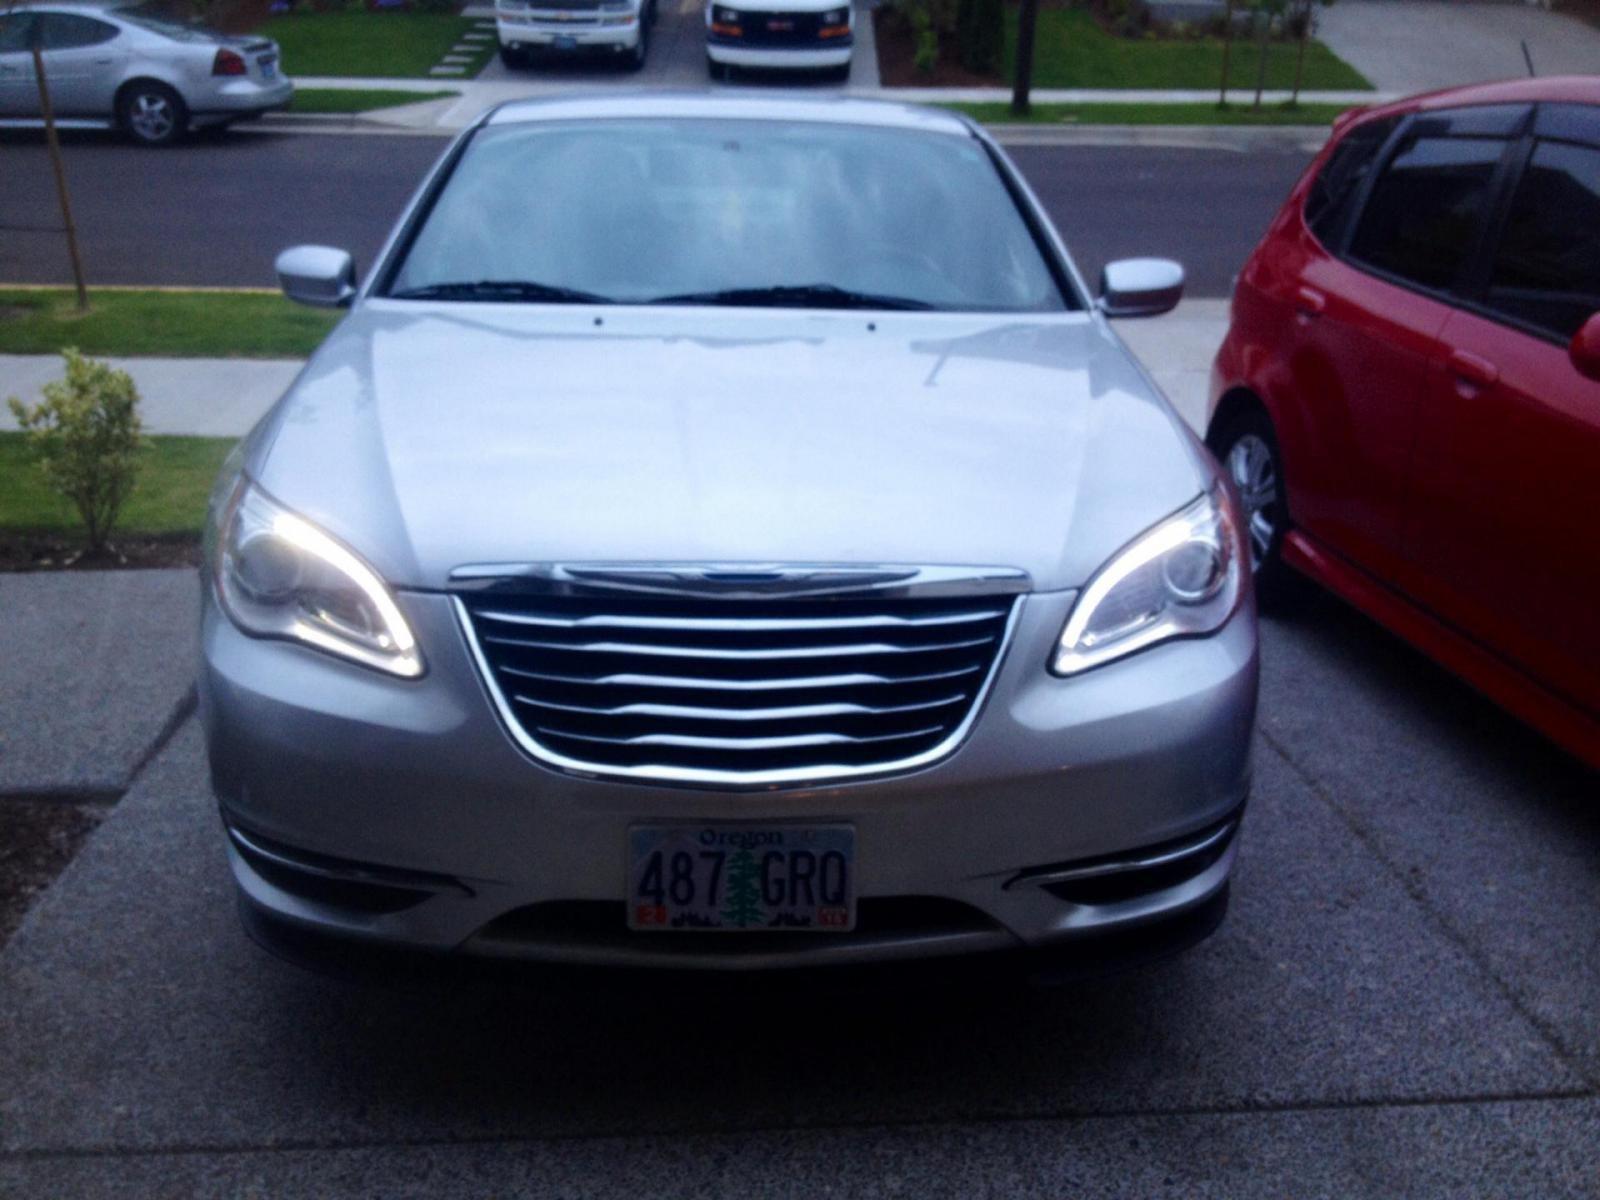 Chrysler 200 Limited >> New to me: 2012 Chrysler 200 Touring